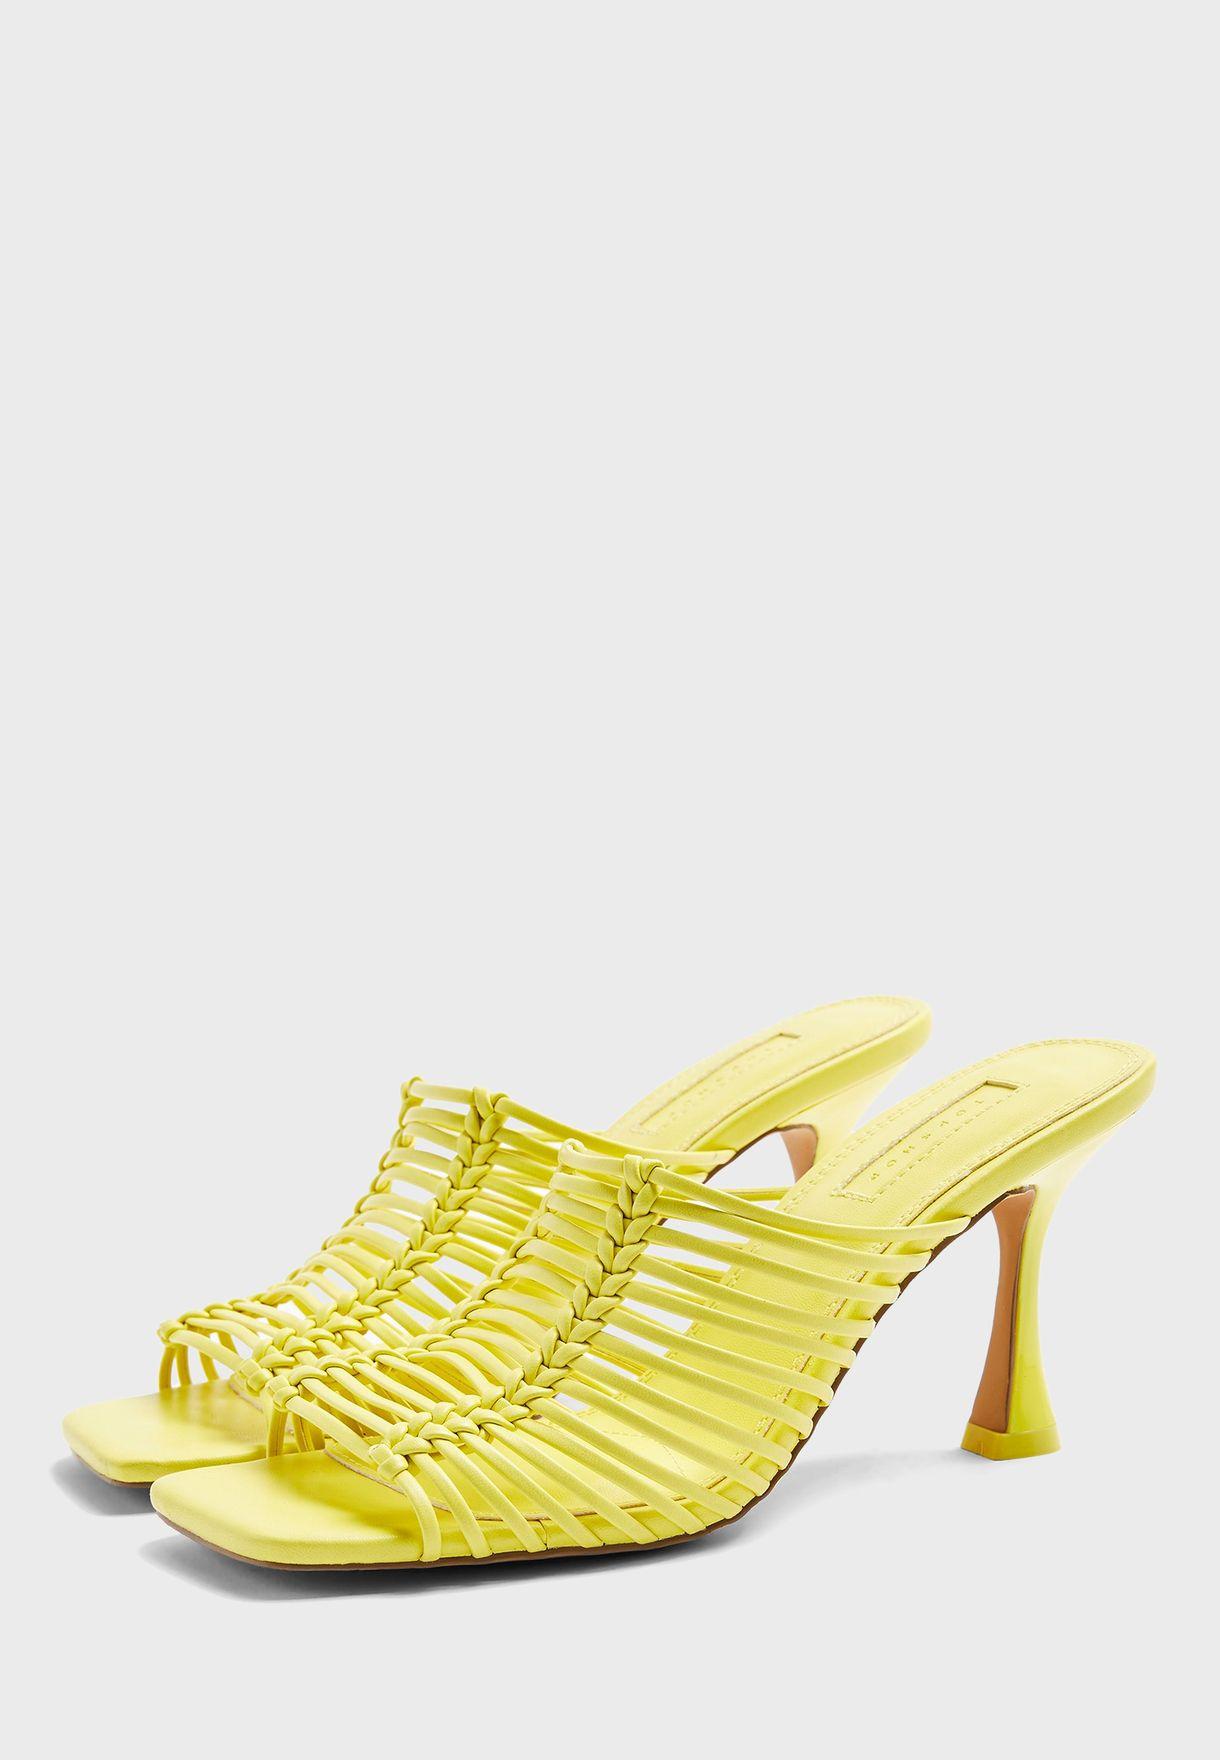 Topshop Noon High Heel Sandal - Brand Shoes